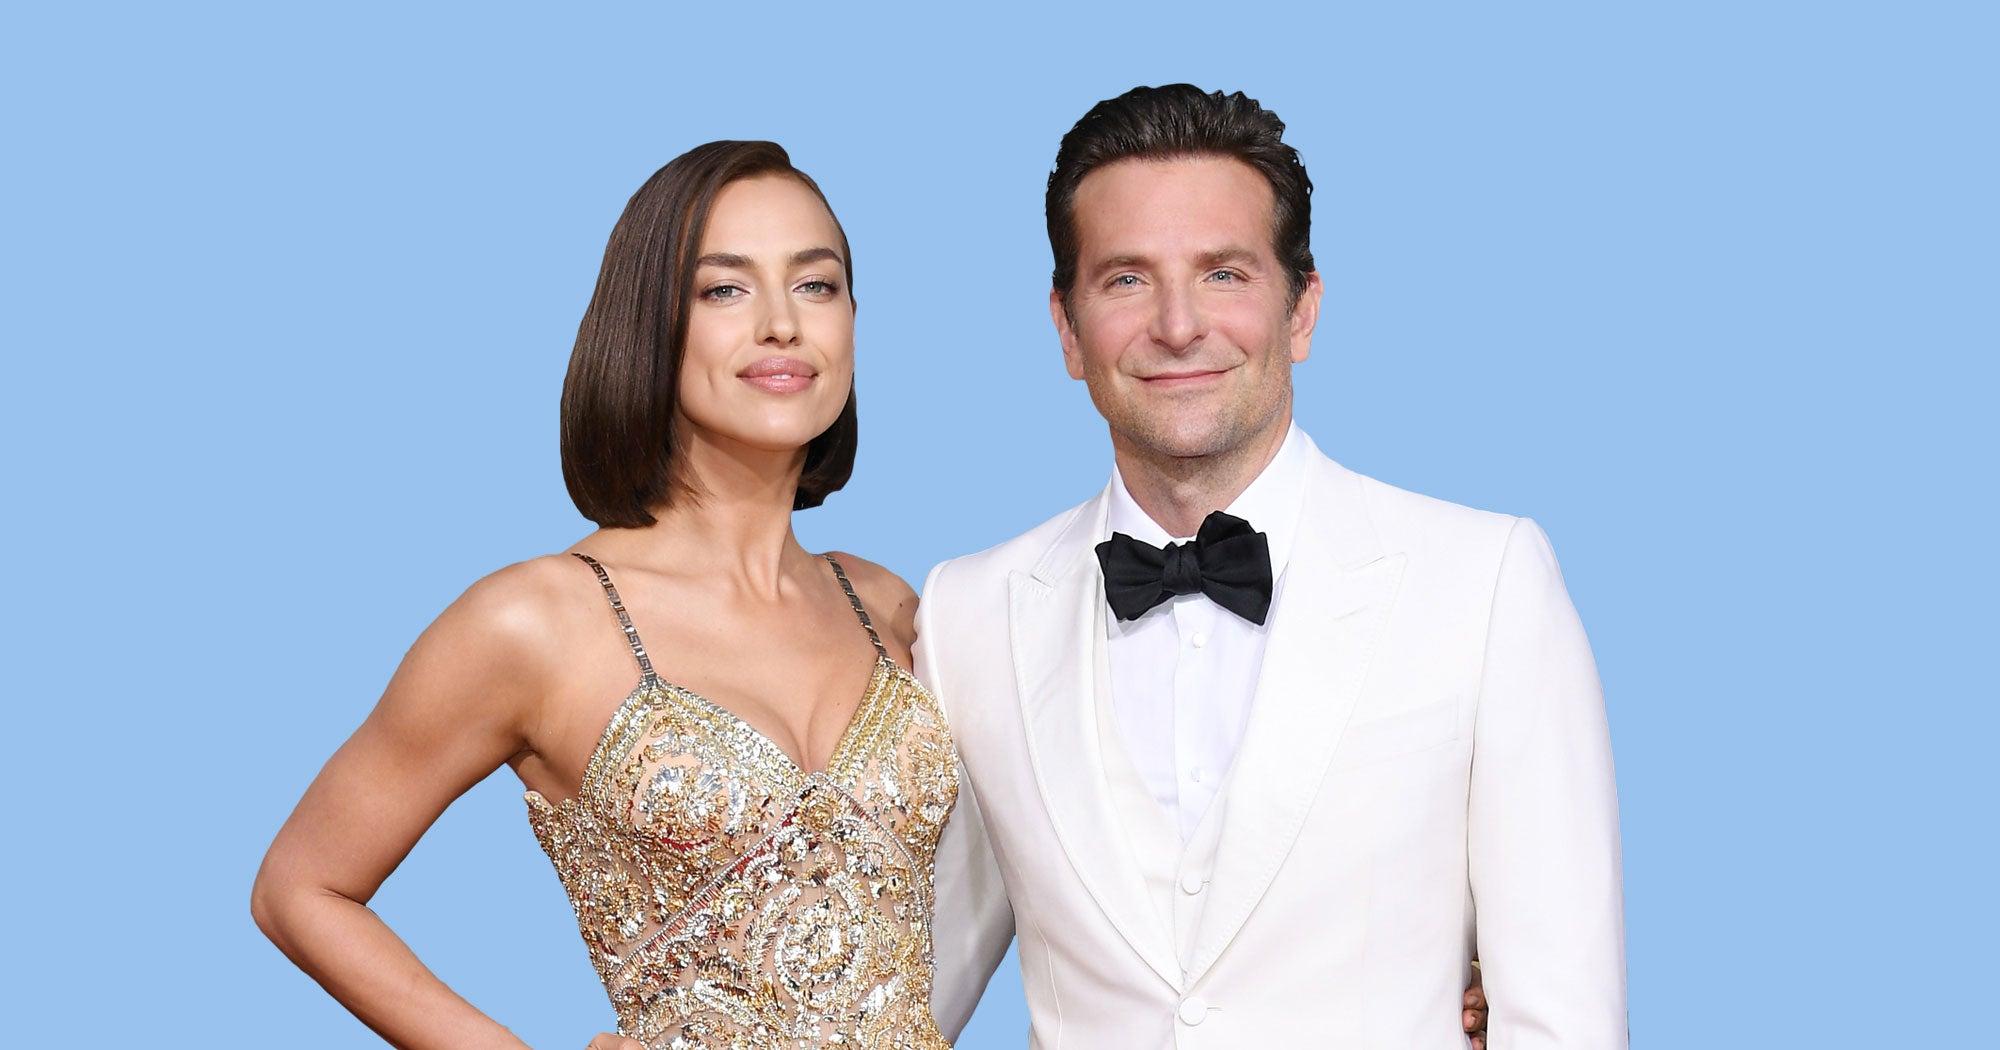 Irina Shayk Got Candid About Her Split From Bradley Cooper